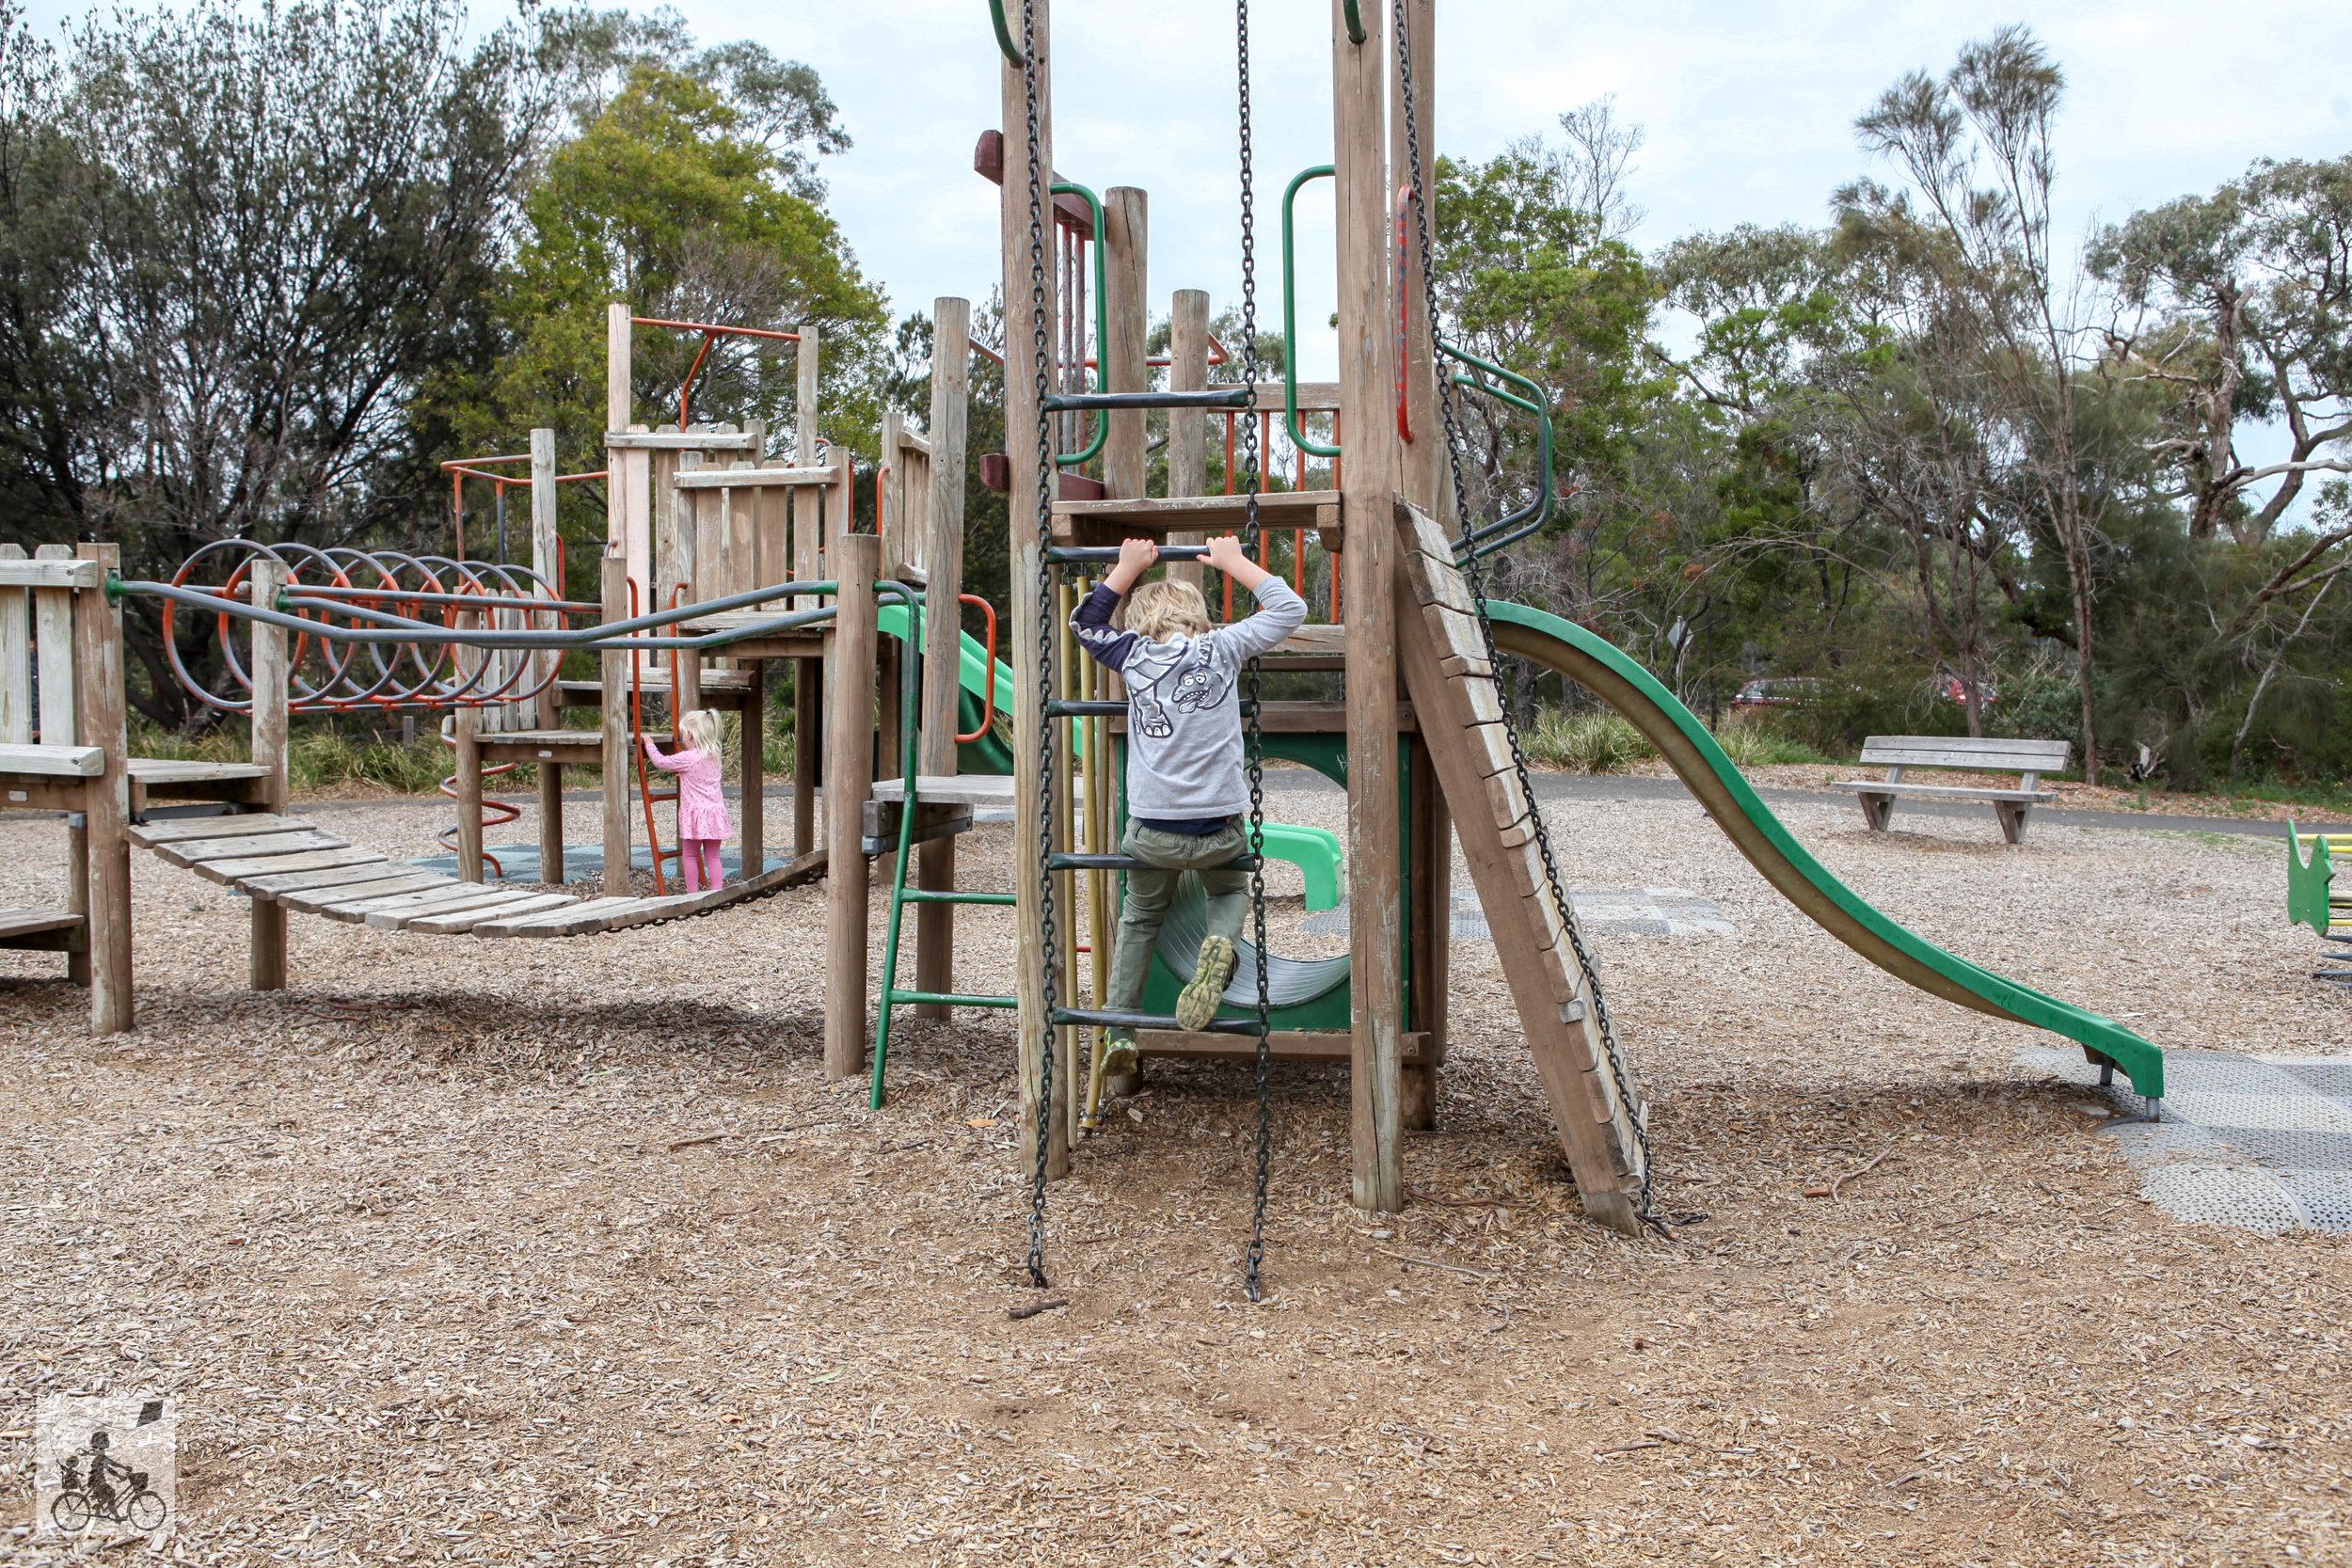 Mamma Knows South - karkarook park, heatherton